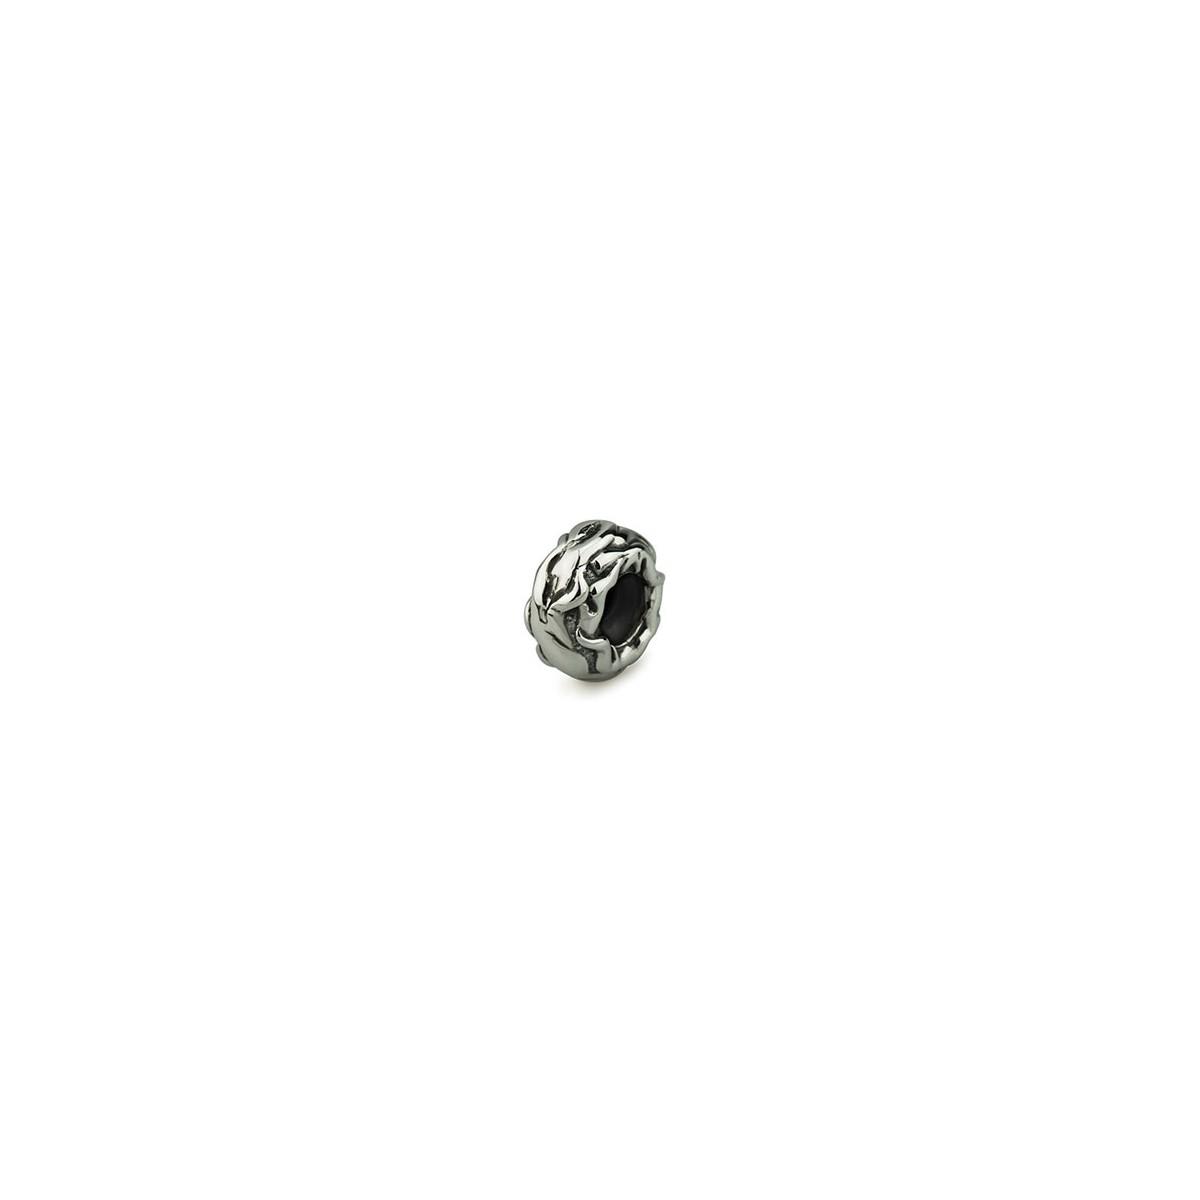 ohm beads/whc002/stop/ Fire-ish/pandora/trollbeads